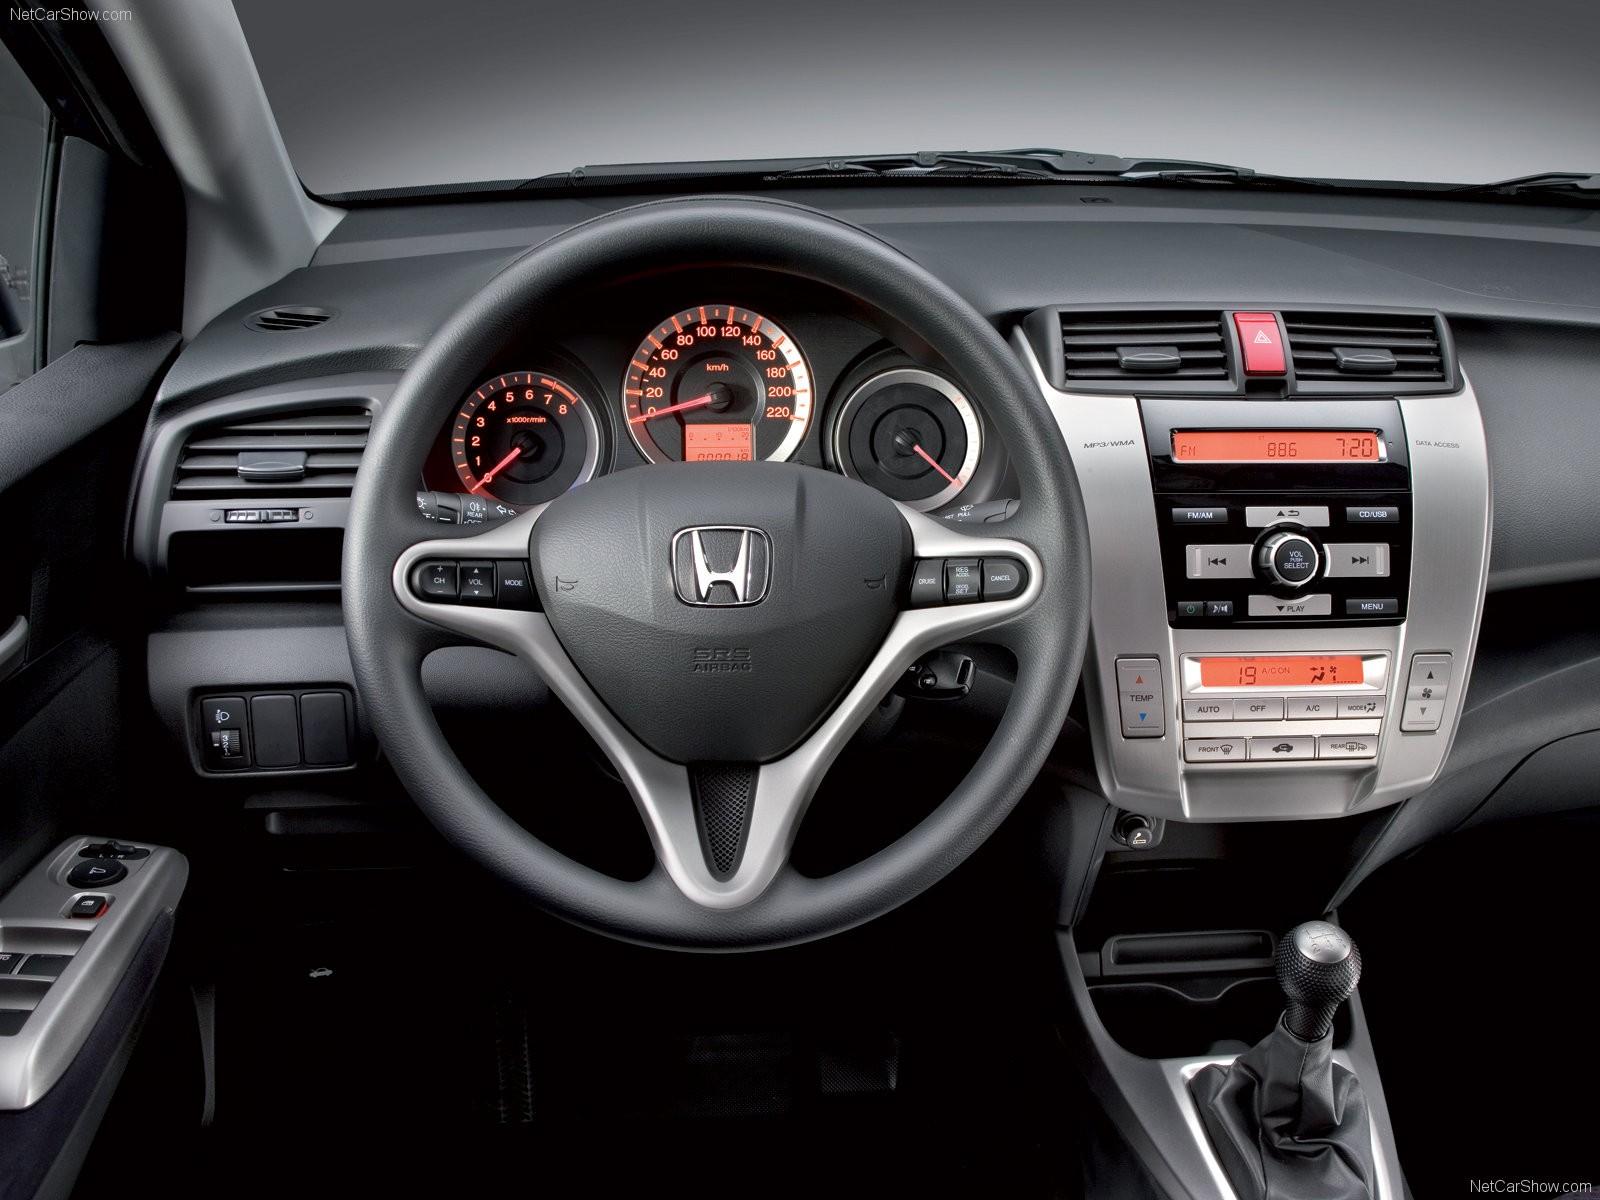 Honda-City-2009-1600-08